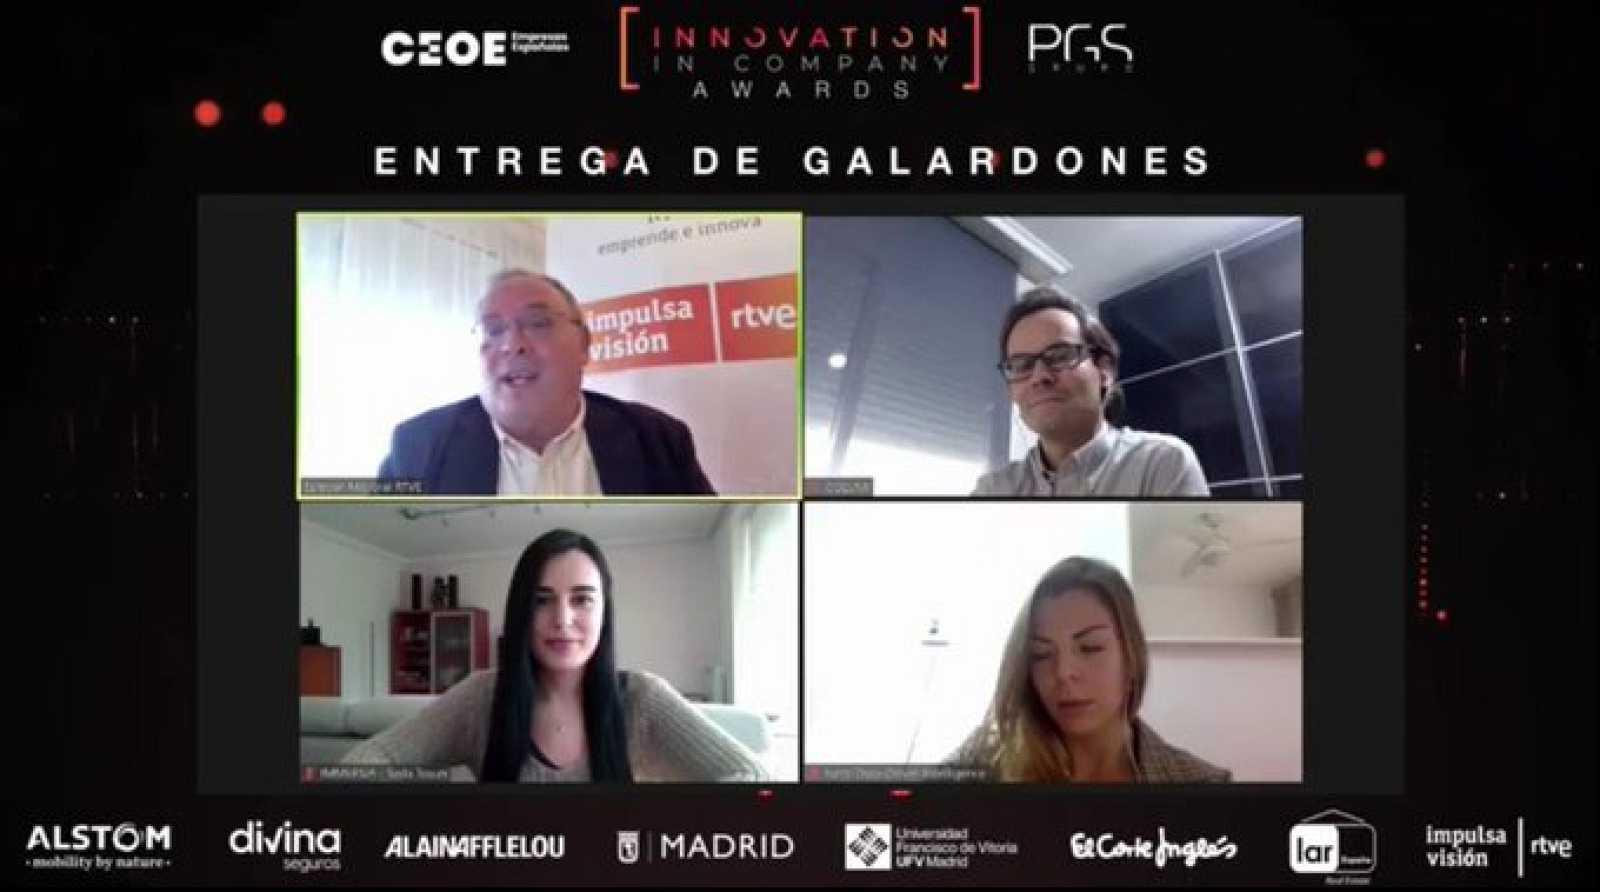 Premios Innovation in company